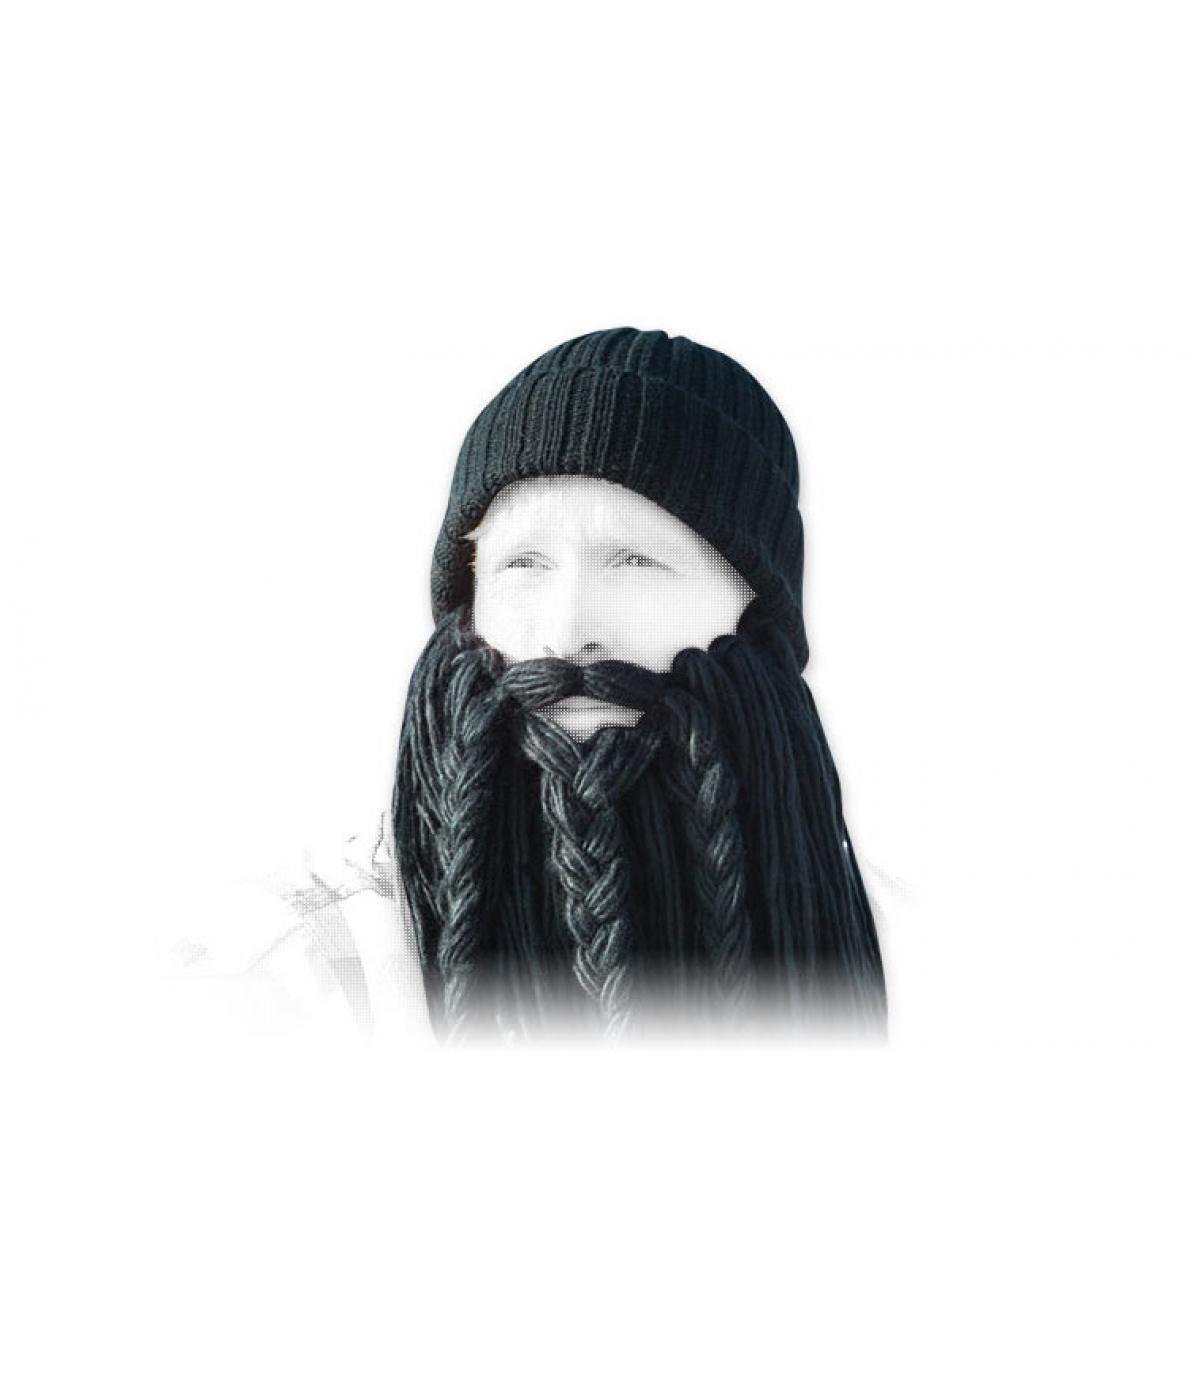 Langer schwarzer Wikinger Bart